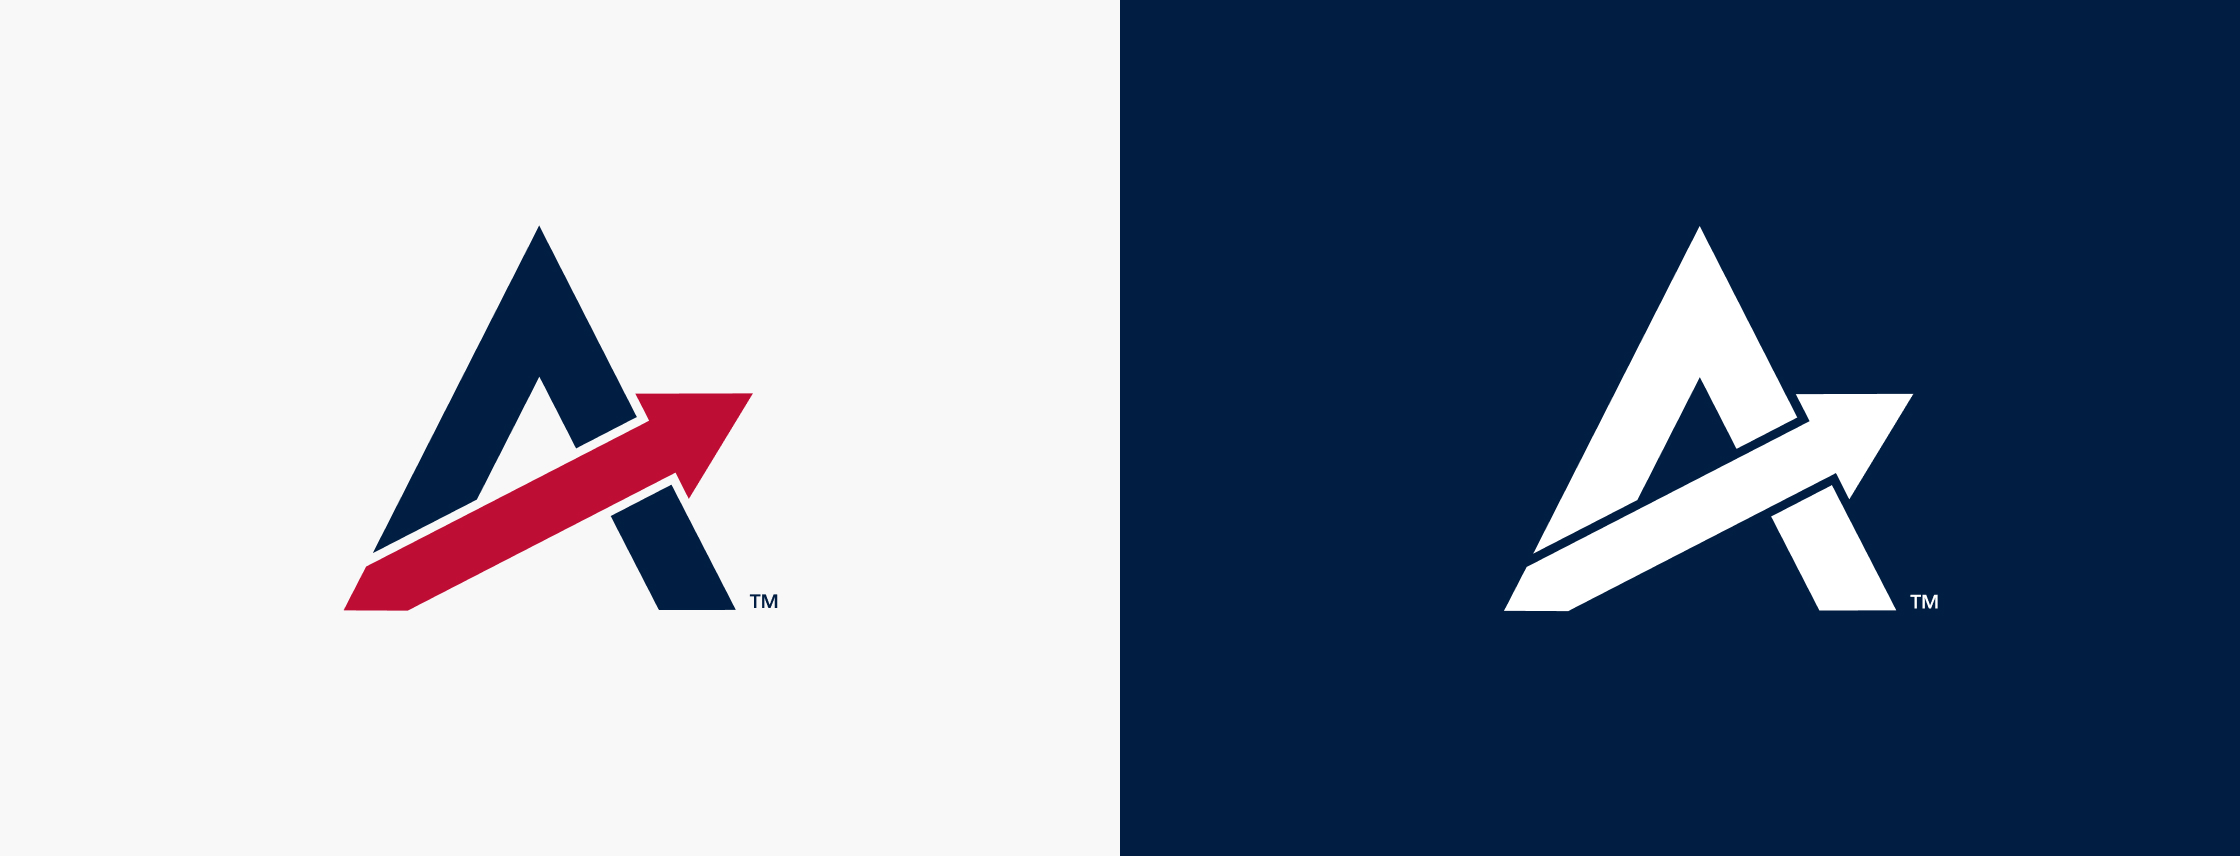 SmarterAI Logo - The Arrow Symbol